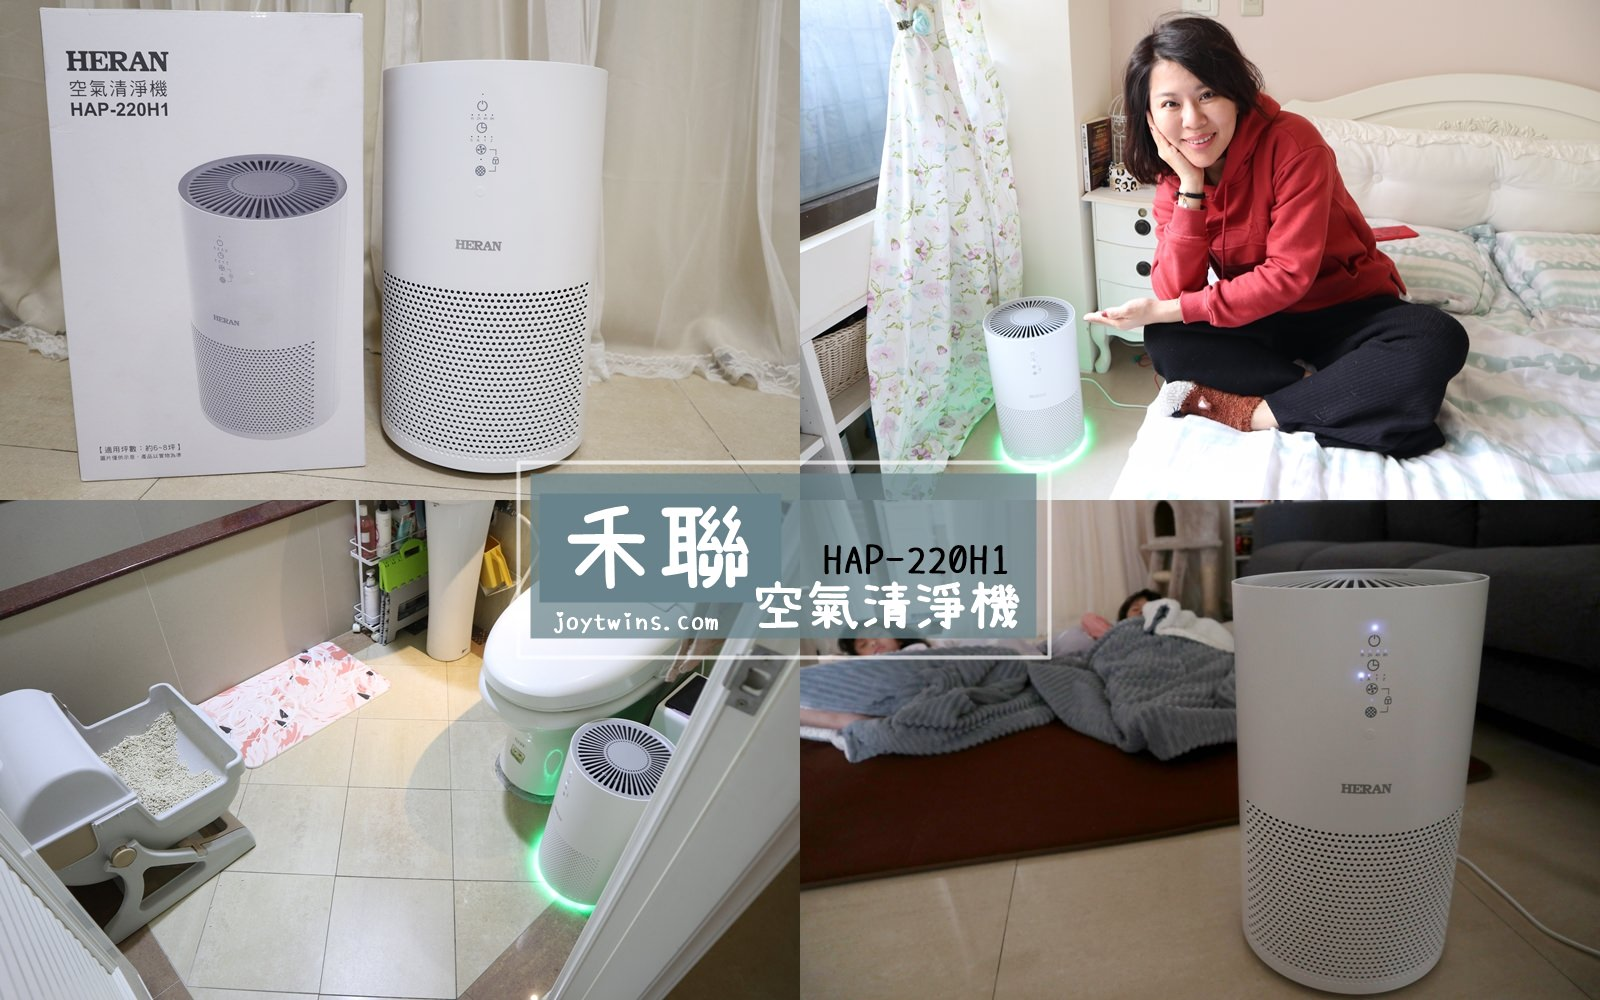 【HERAN 禾聯】小清新智慧抗敏空氣清淨機/偵測PM2.5/偵測異味(HAP-220H1) 小而巧 360度無死角的把關好空氣